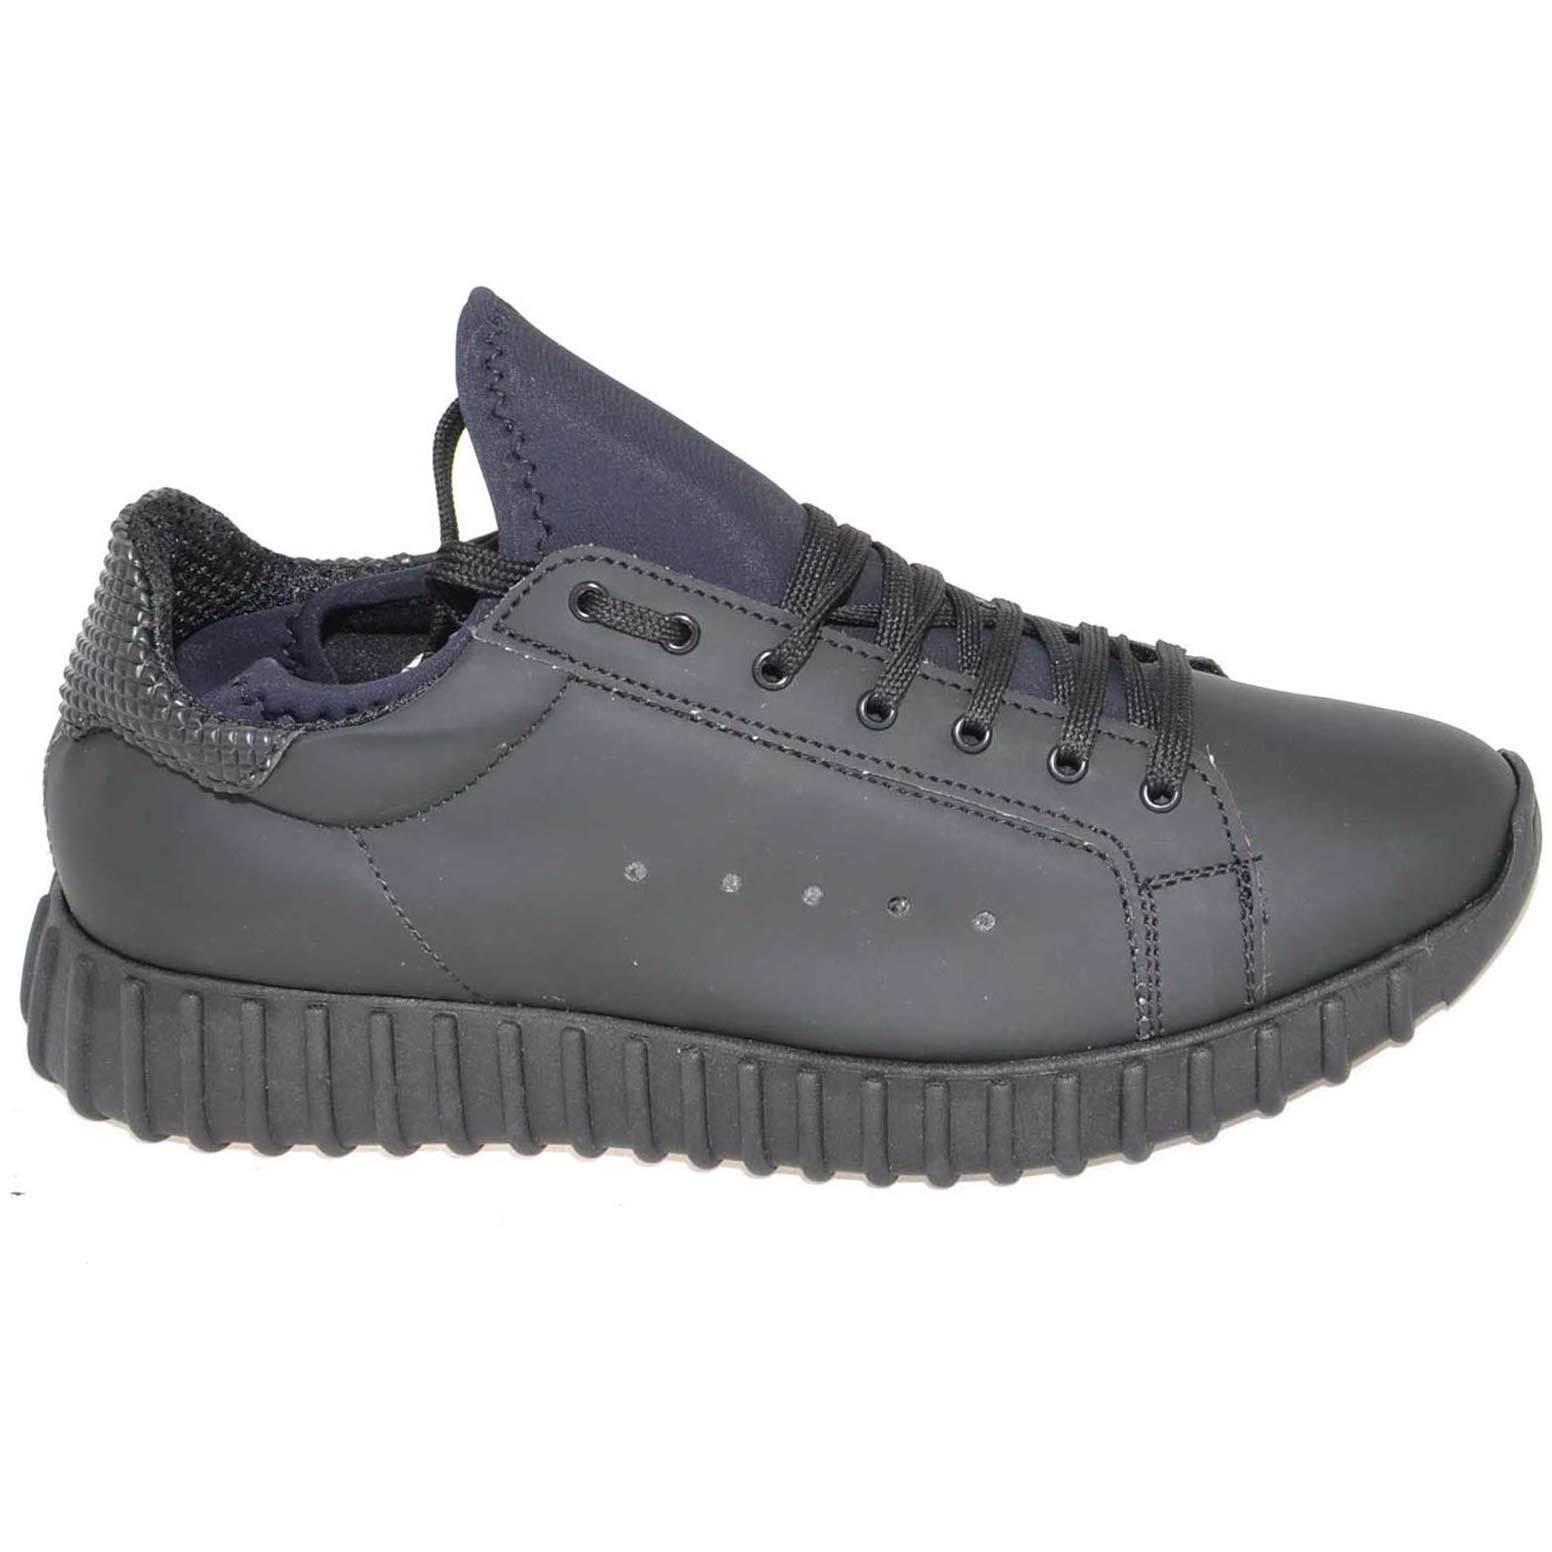 Zapatos de mujer baratos zapatos de mujer Zapatillas bassa uomo art.323 nera pelle gommato con fondo running made in italy m